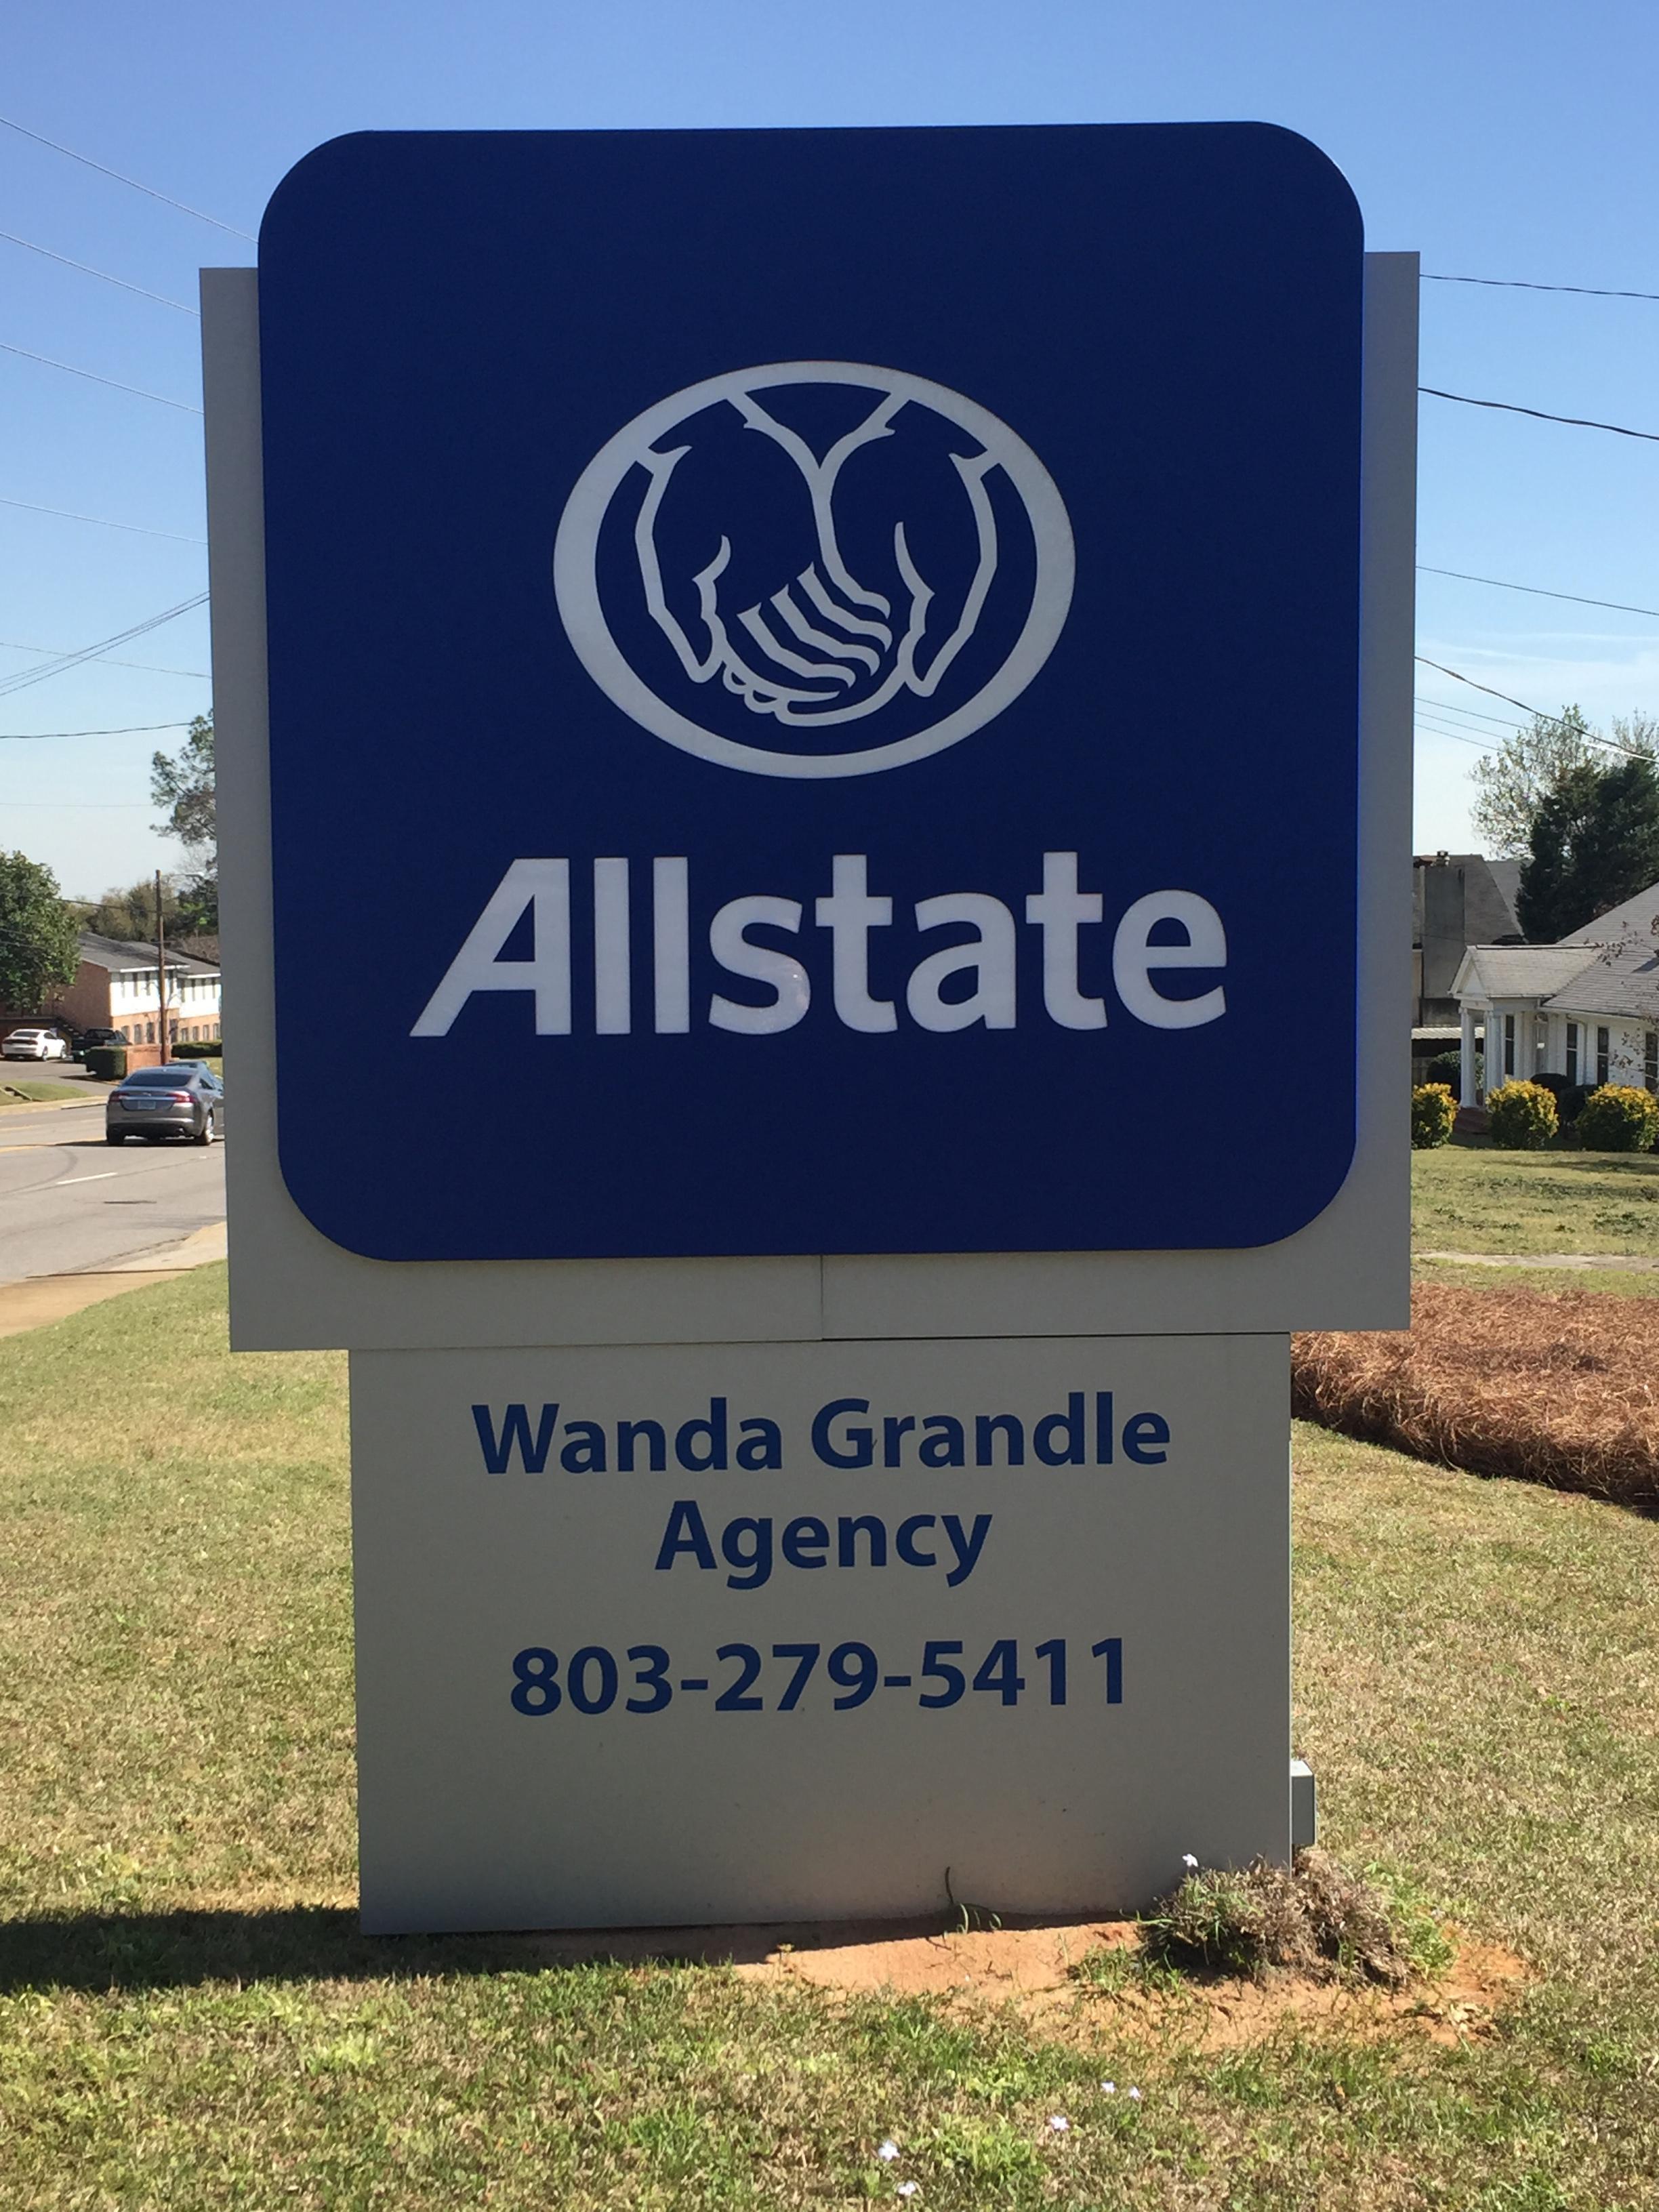 Wanda Grandle: Allstate Insurance image 2